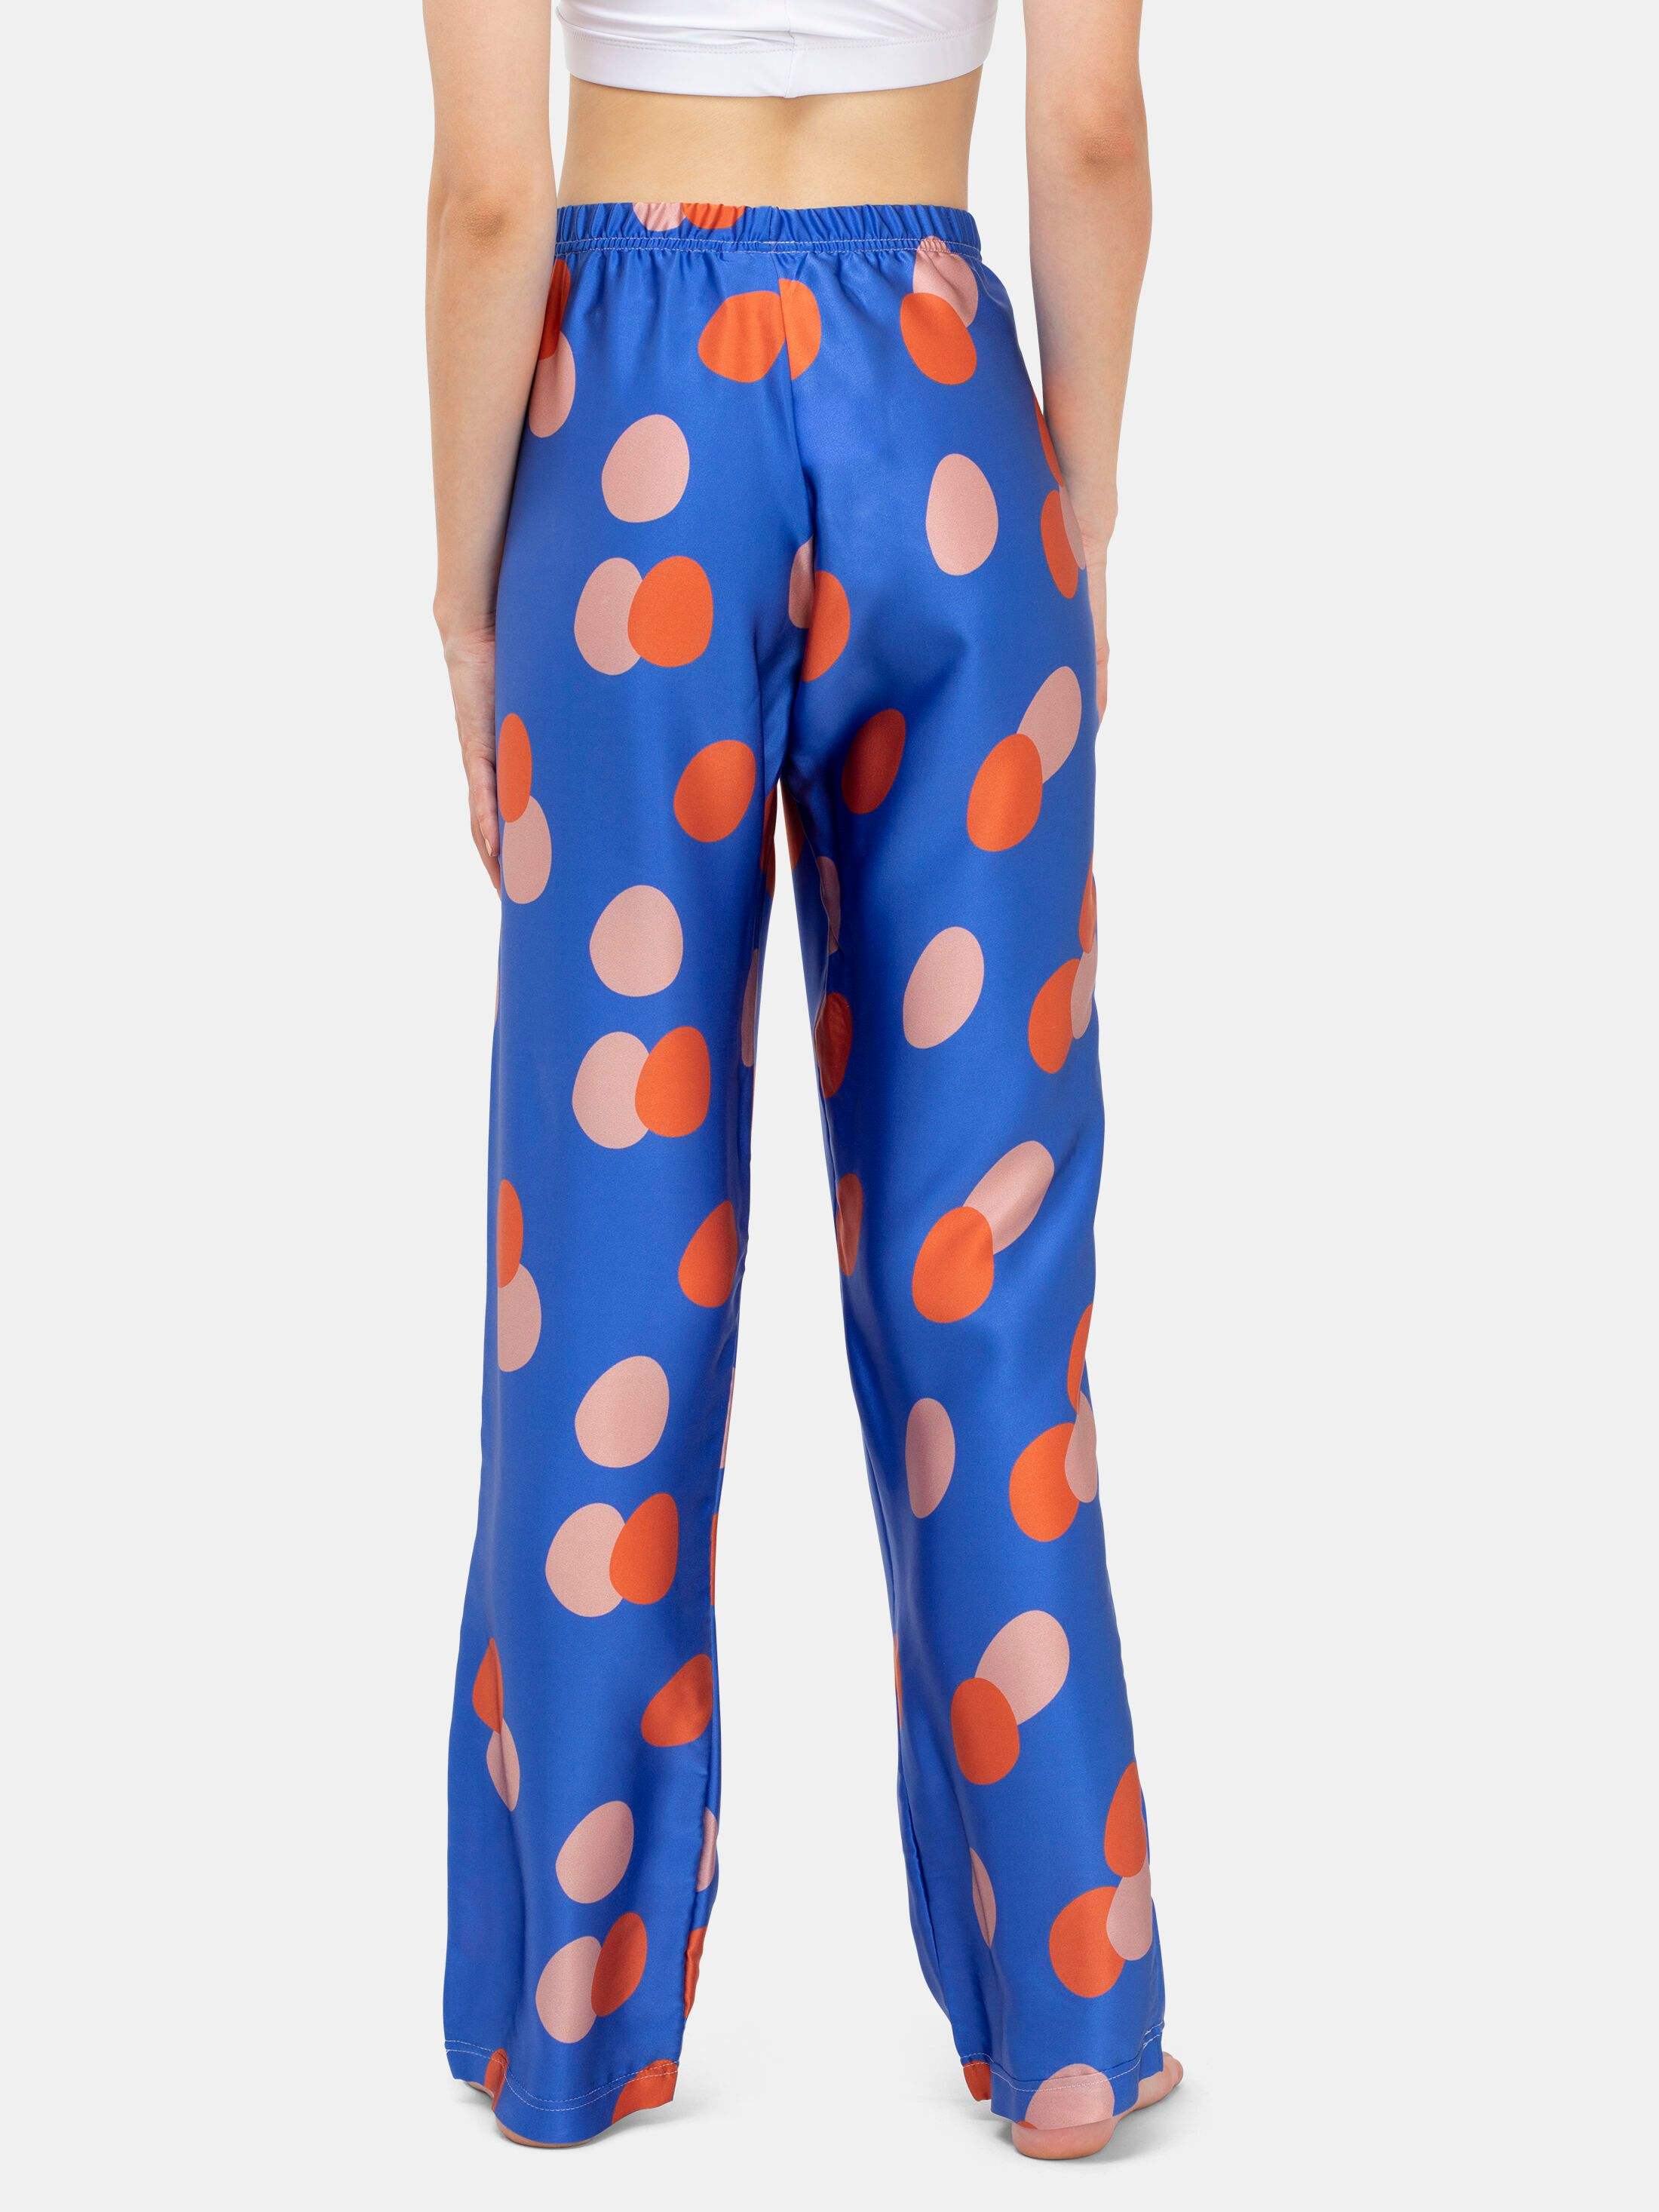 Designa din egen sidenpyjamas